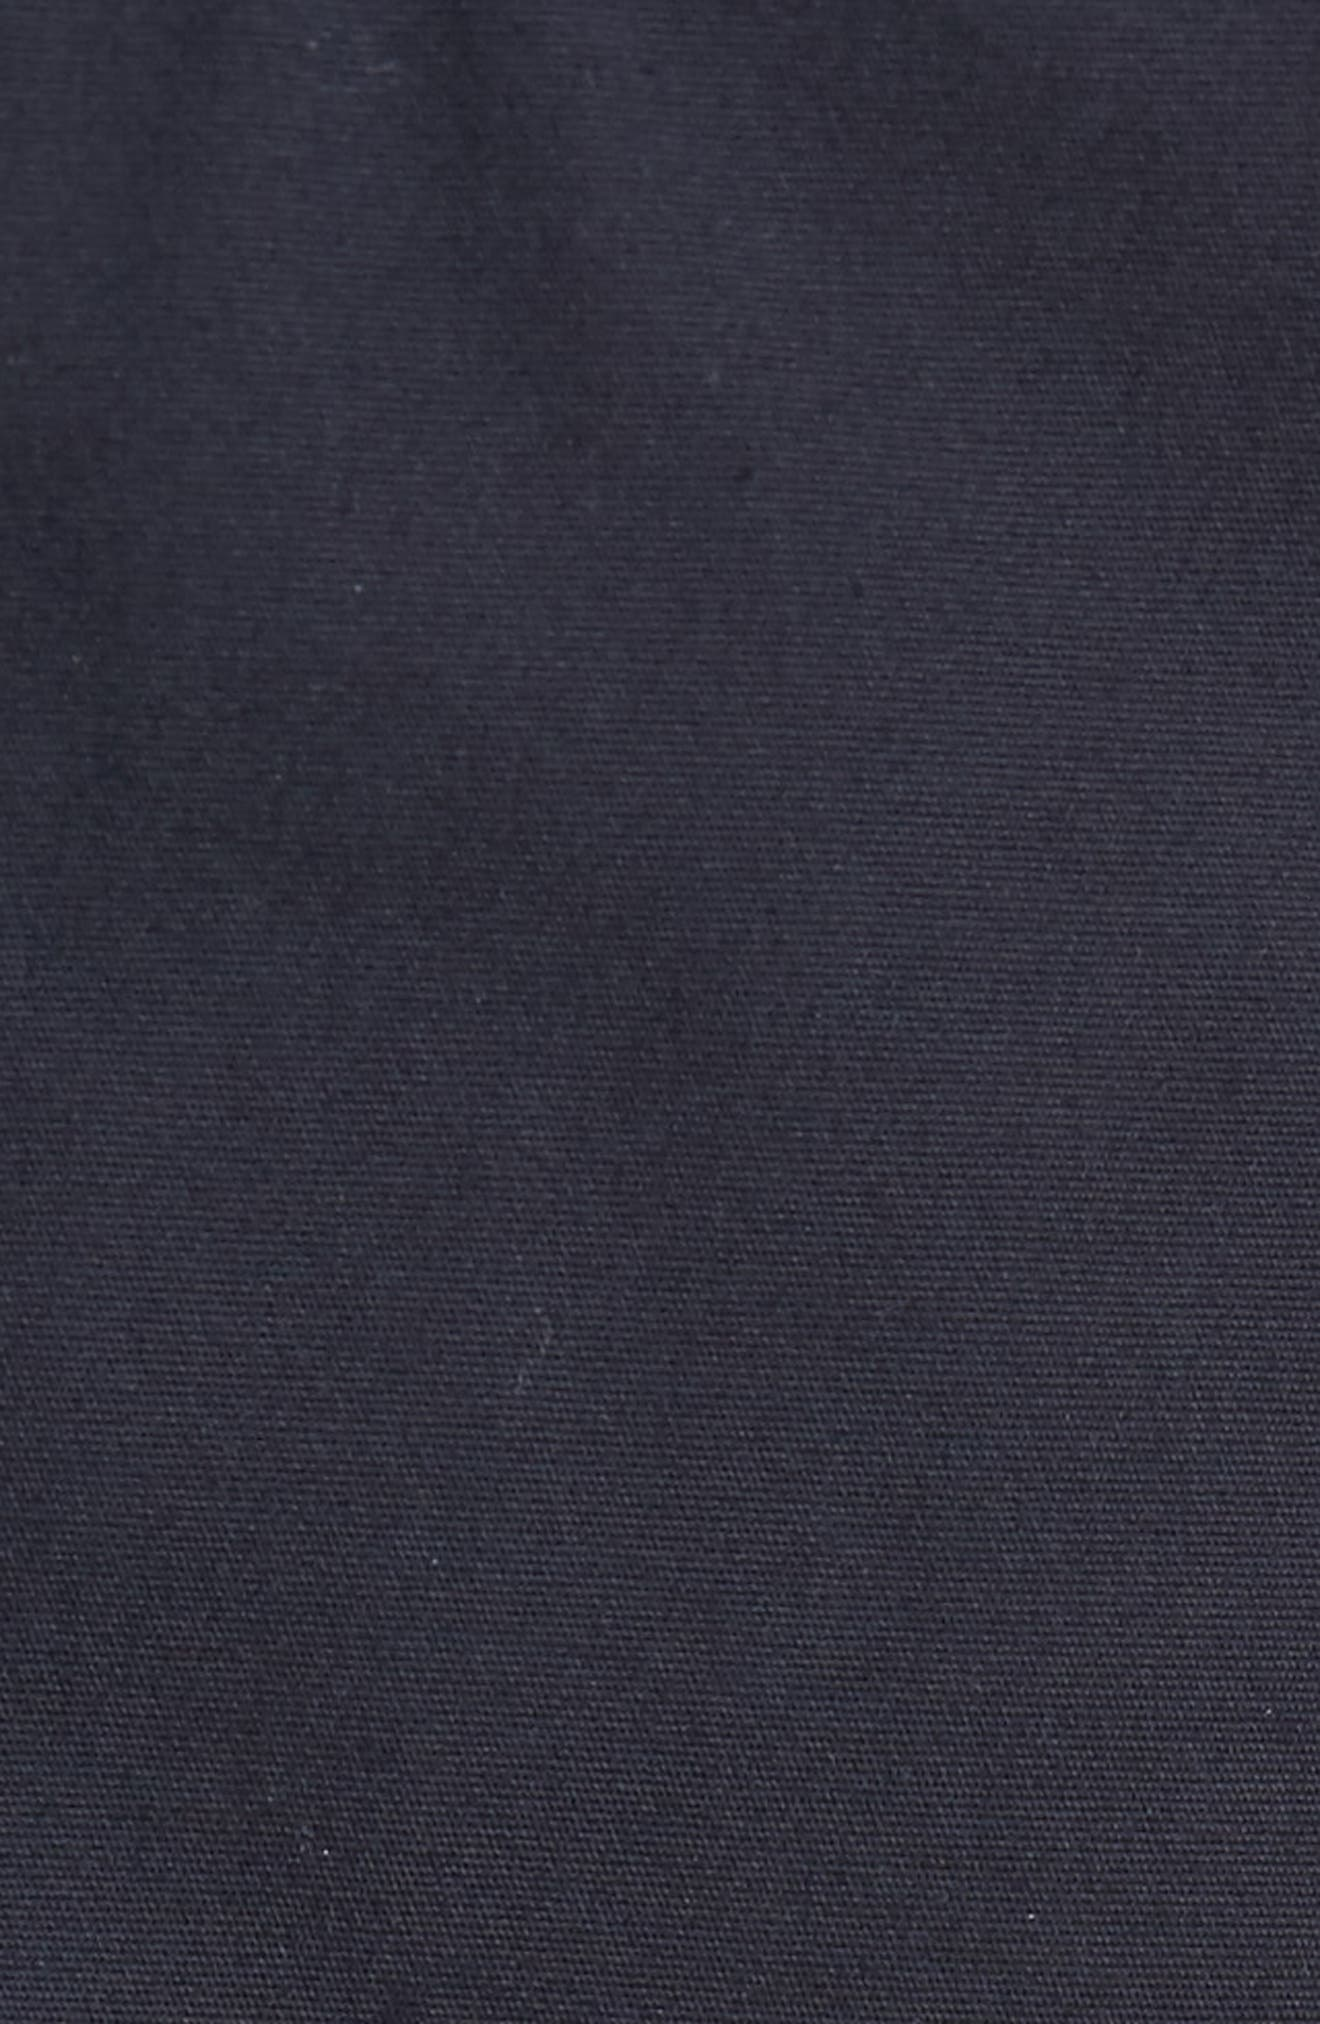 Regular Fit Drawstring Shorts,                             Alternate thumbnail 6, color,                             New Coastal